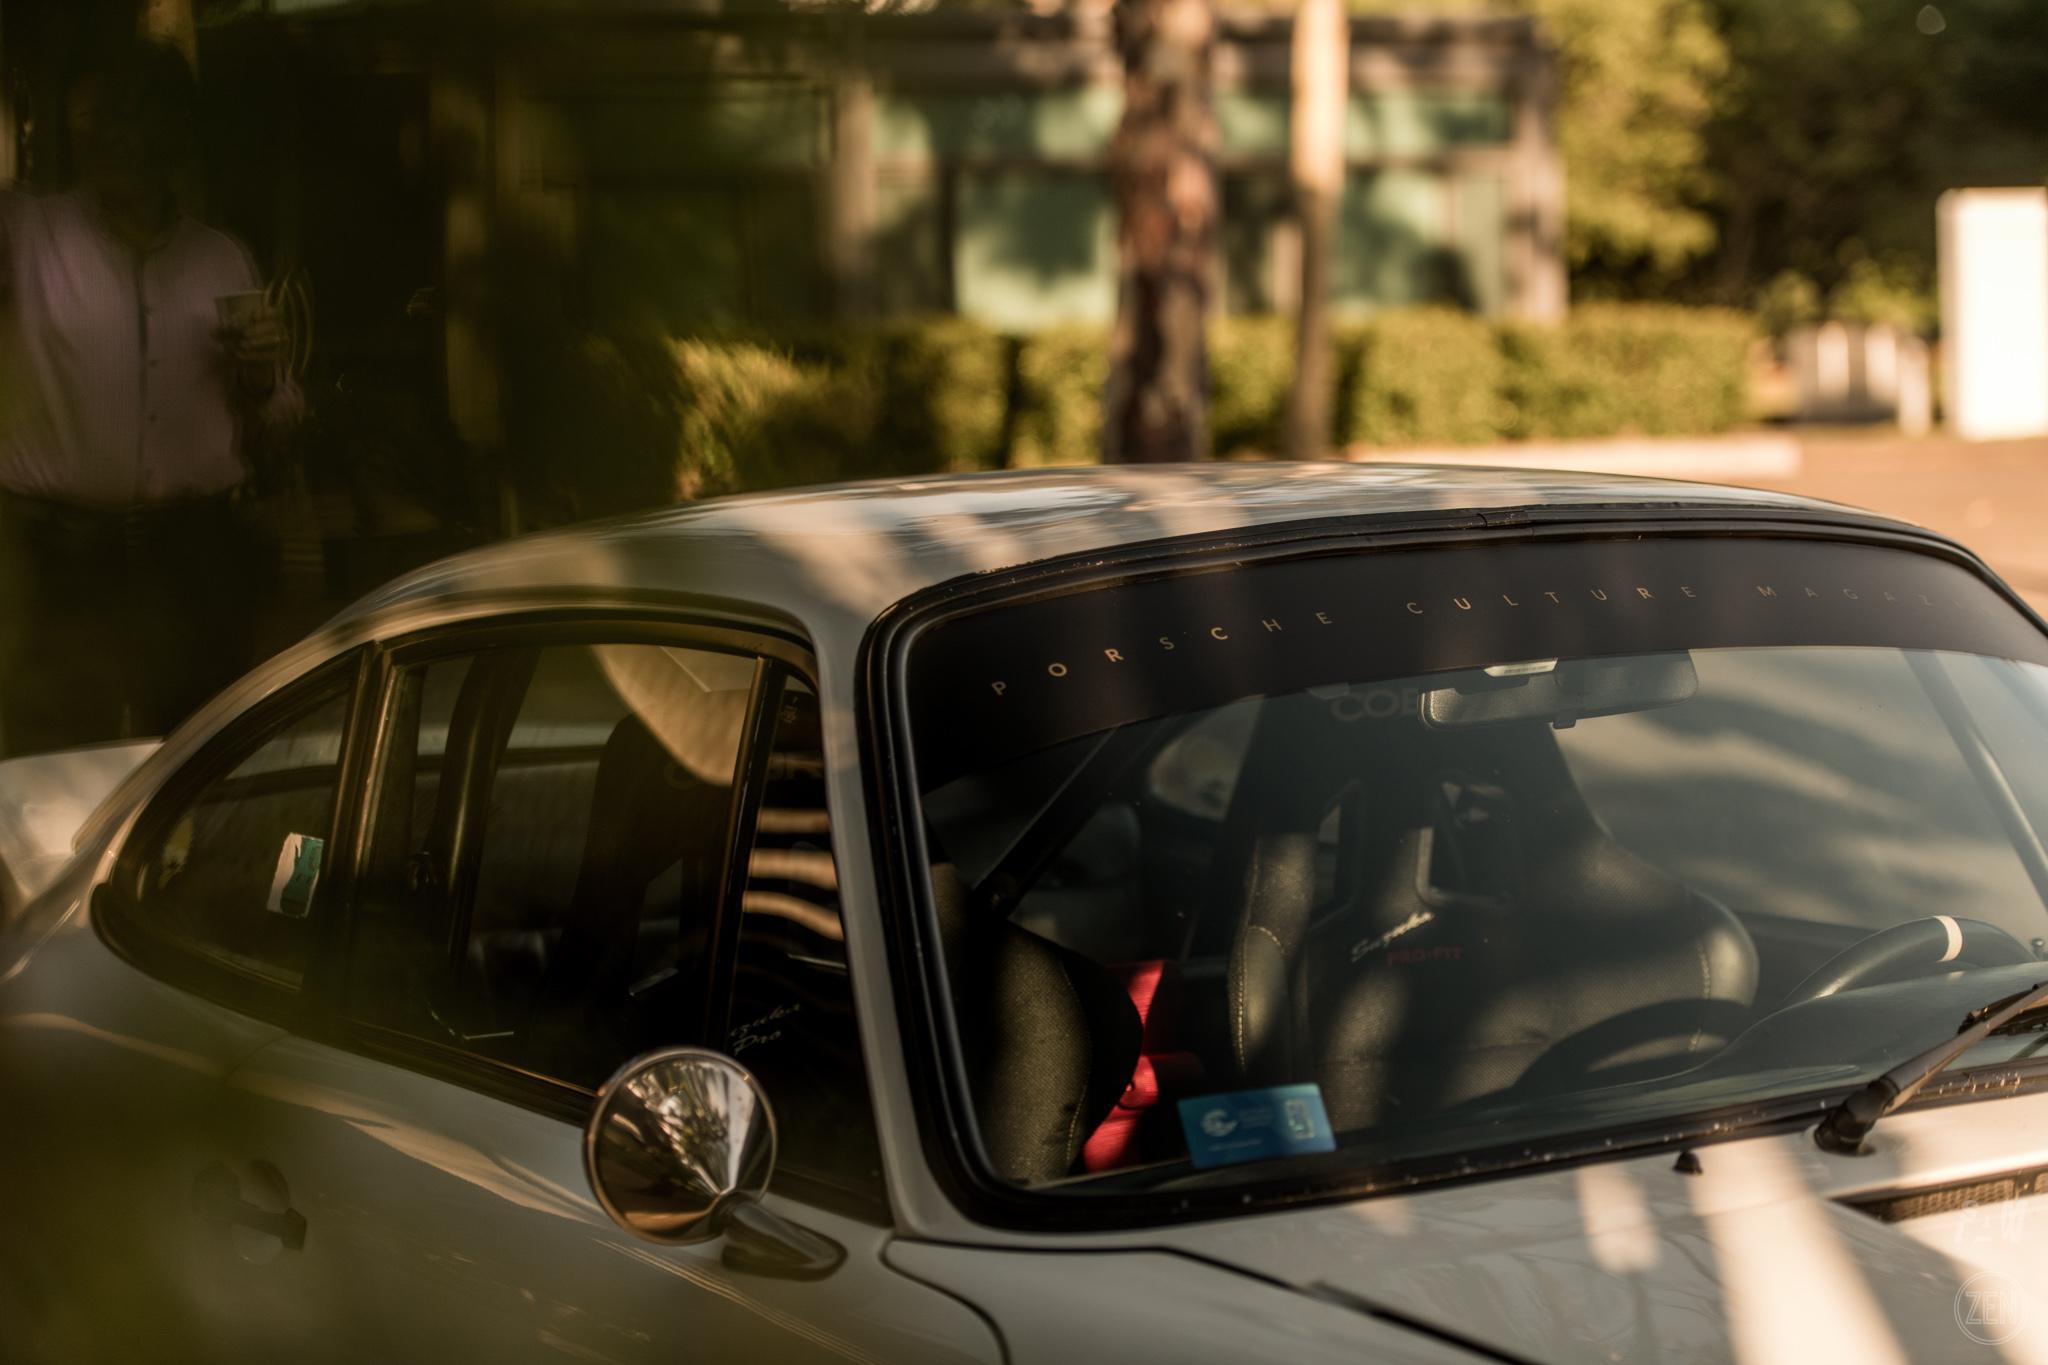 2019-10-27 - Autohaus Porsches & Coffee 060